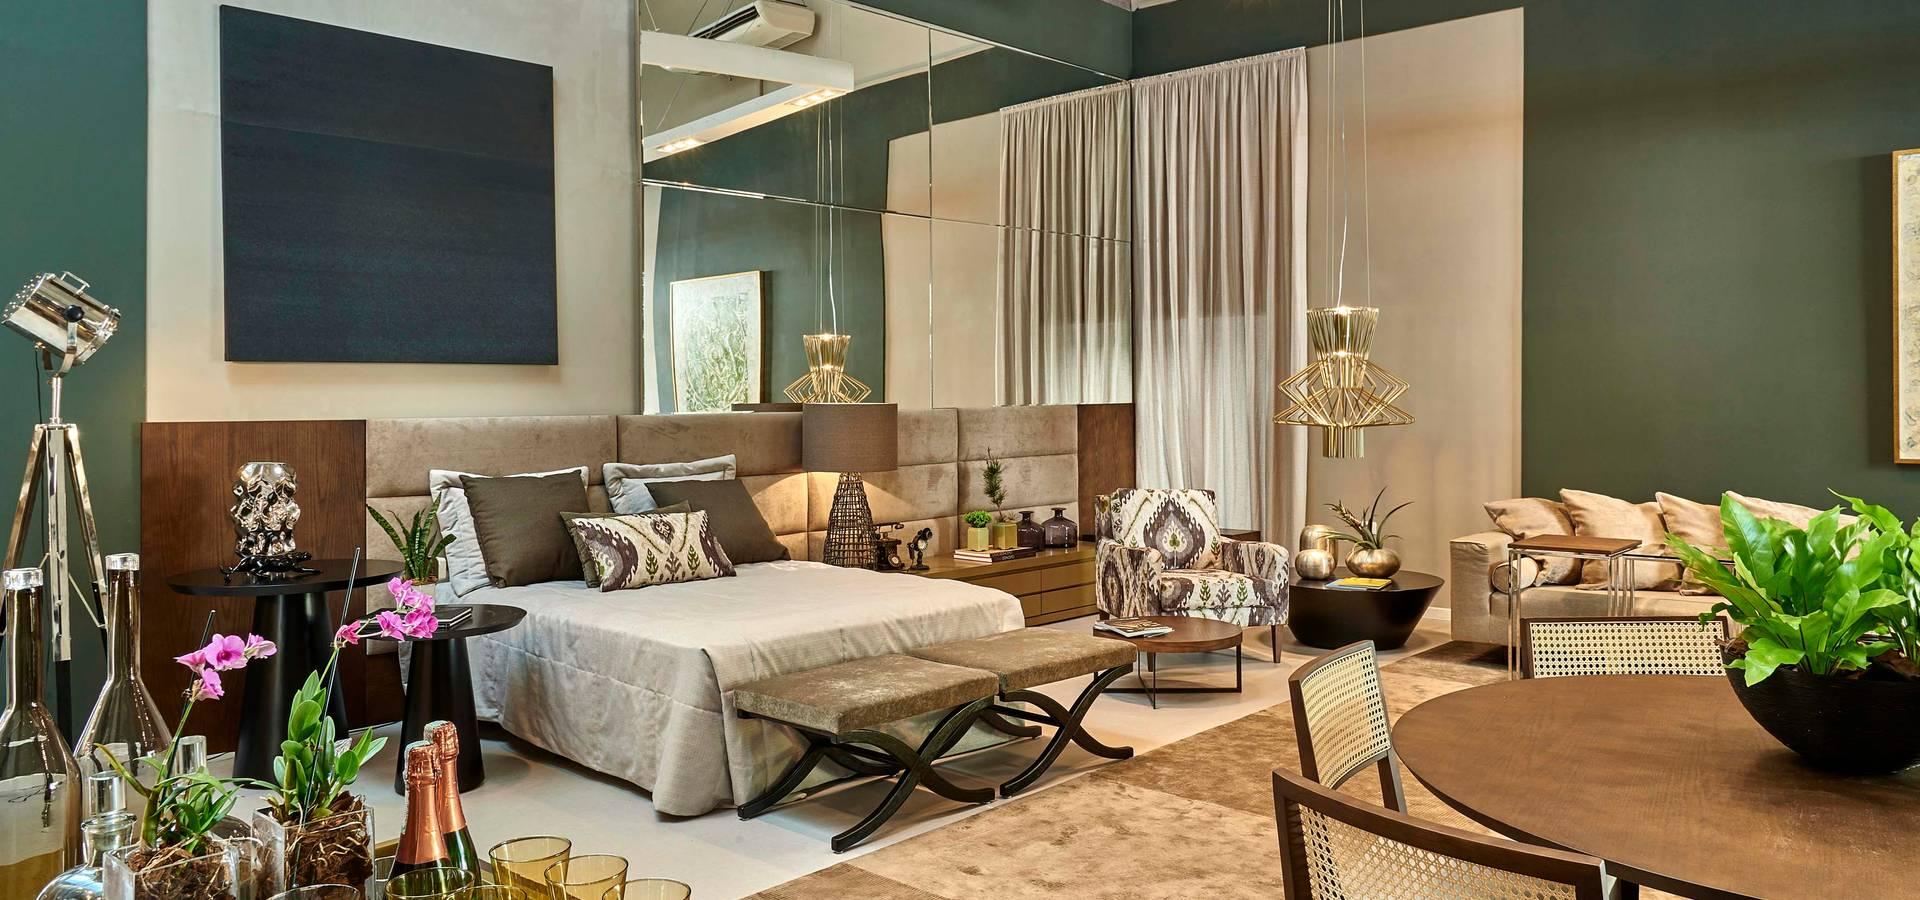 Lider interiores designers de interiores e decoradores em for Decoradores de casas interiores